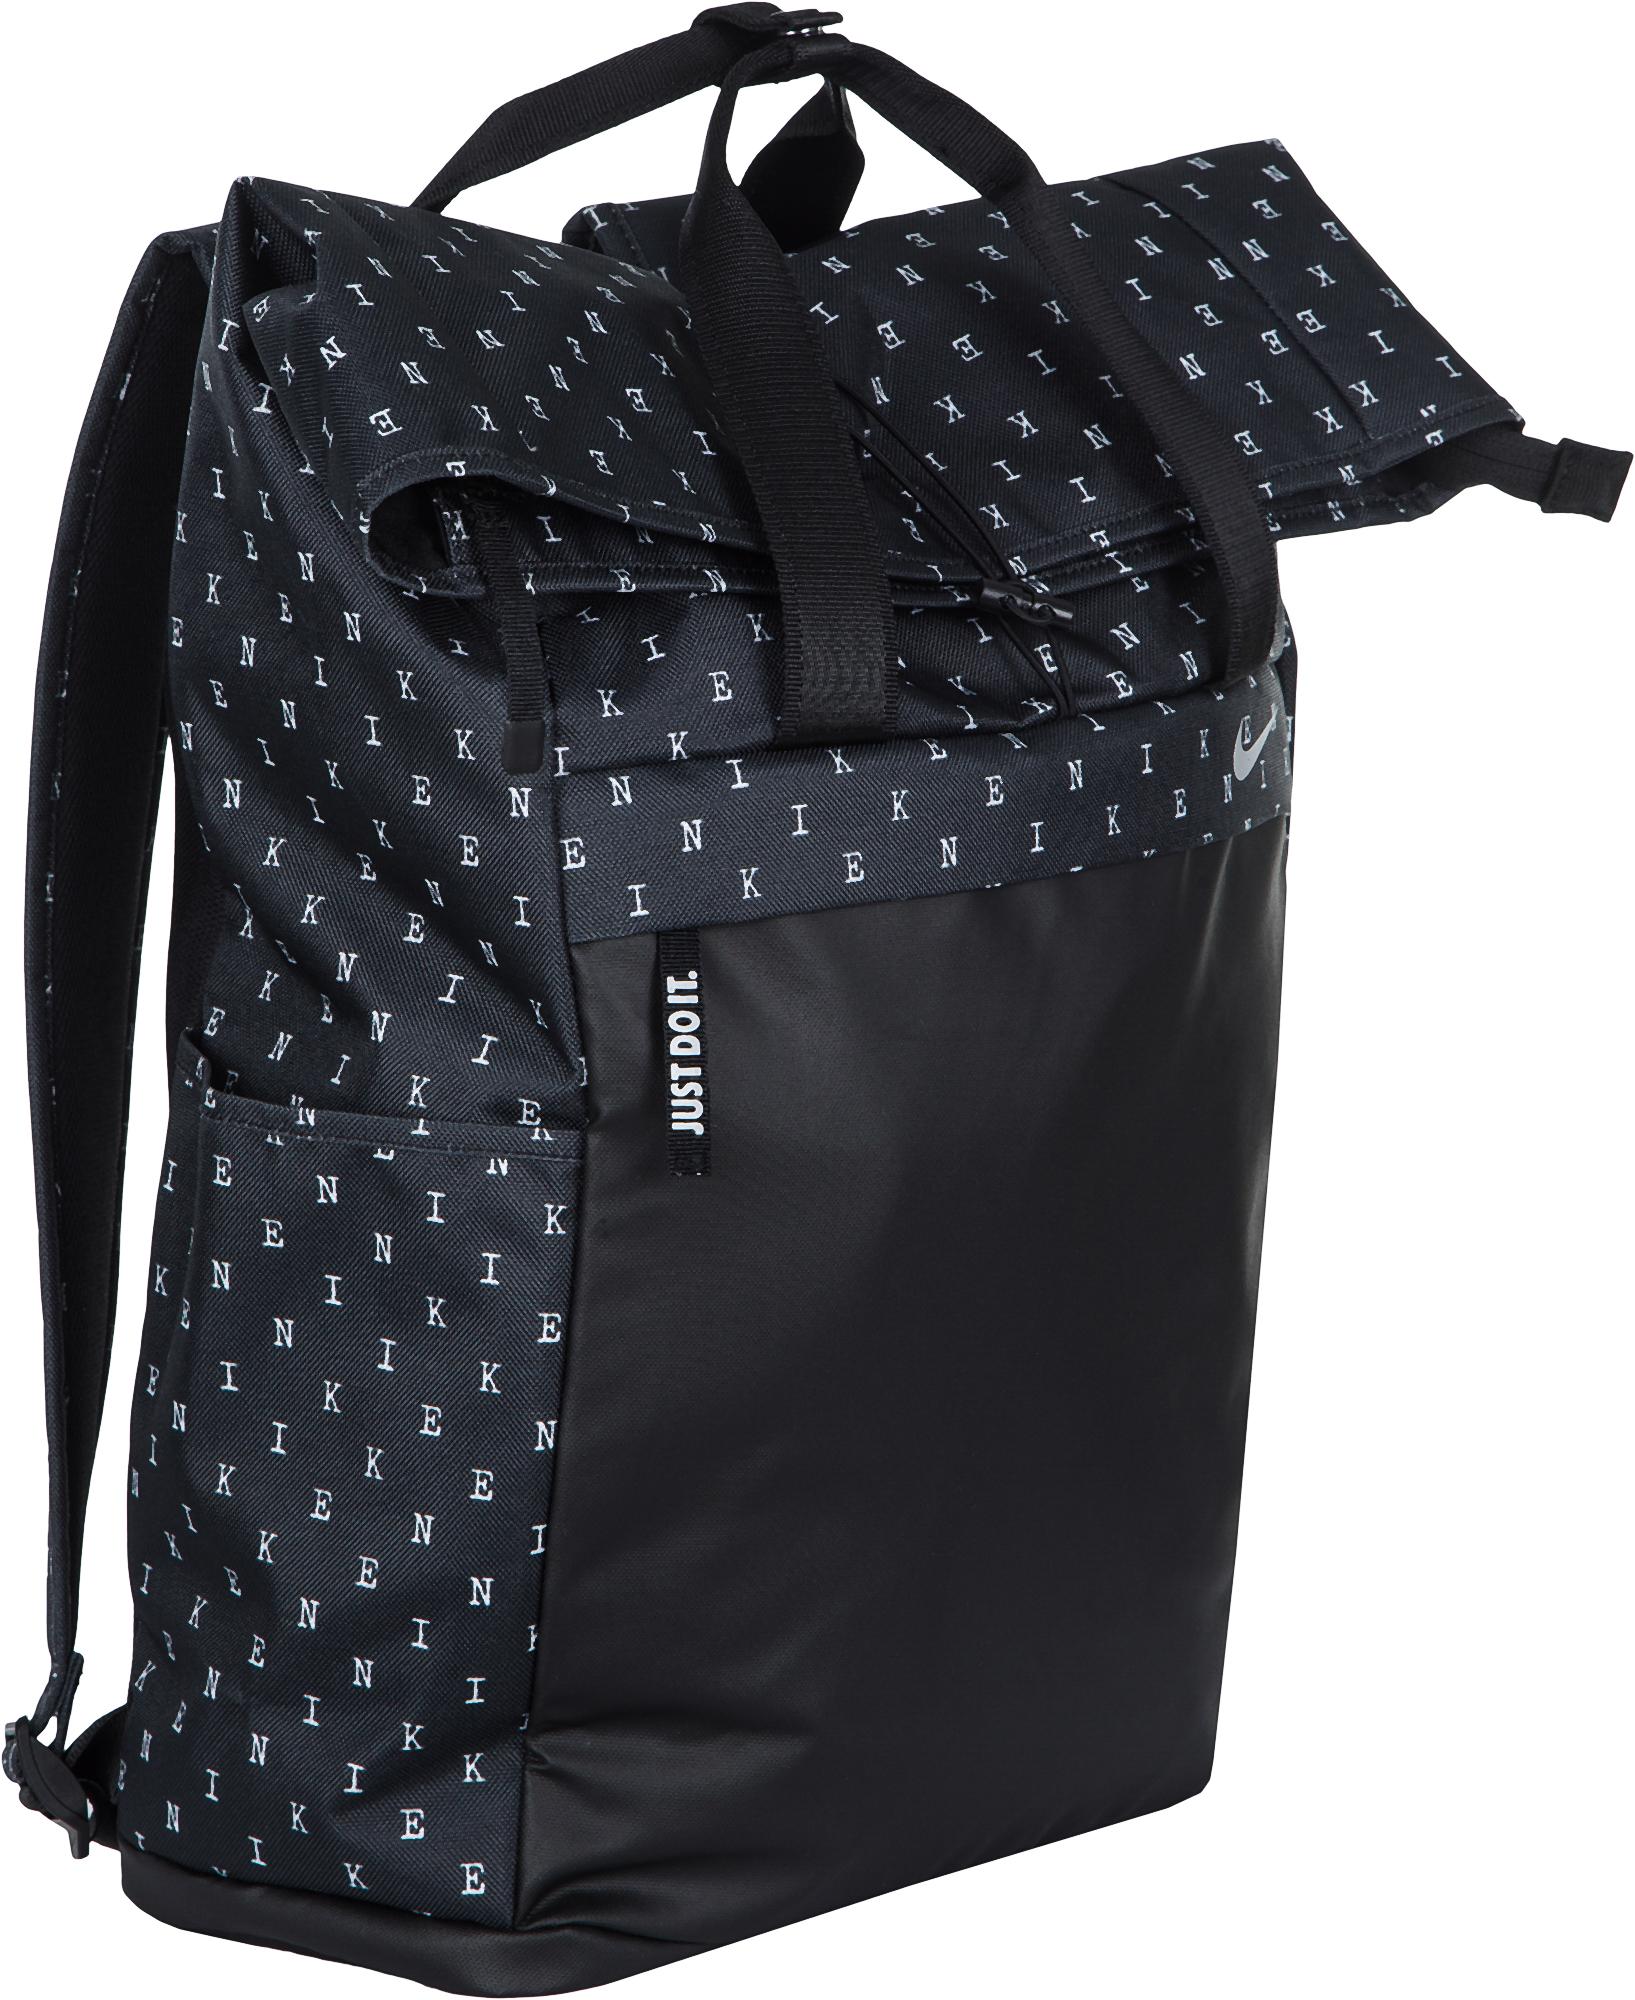 Nike Рюкзак для женщин Radiate